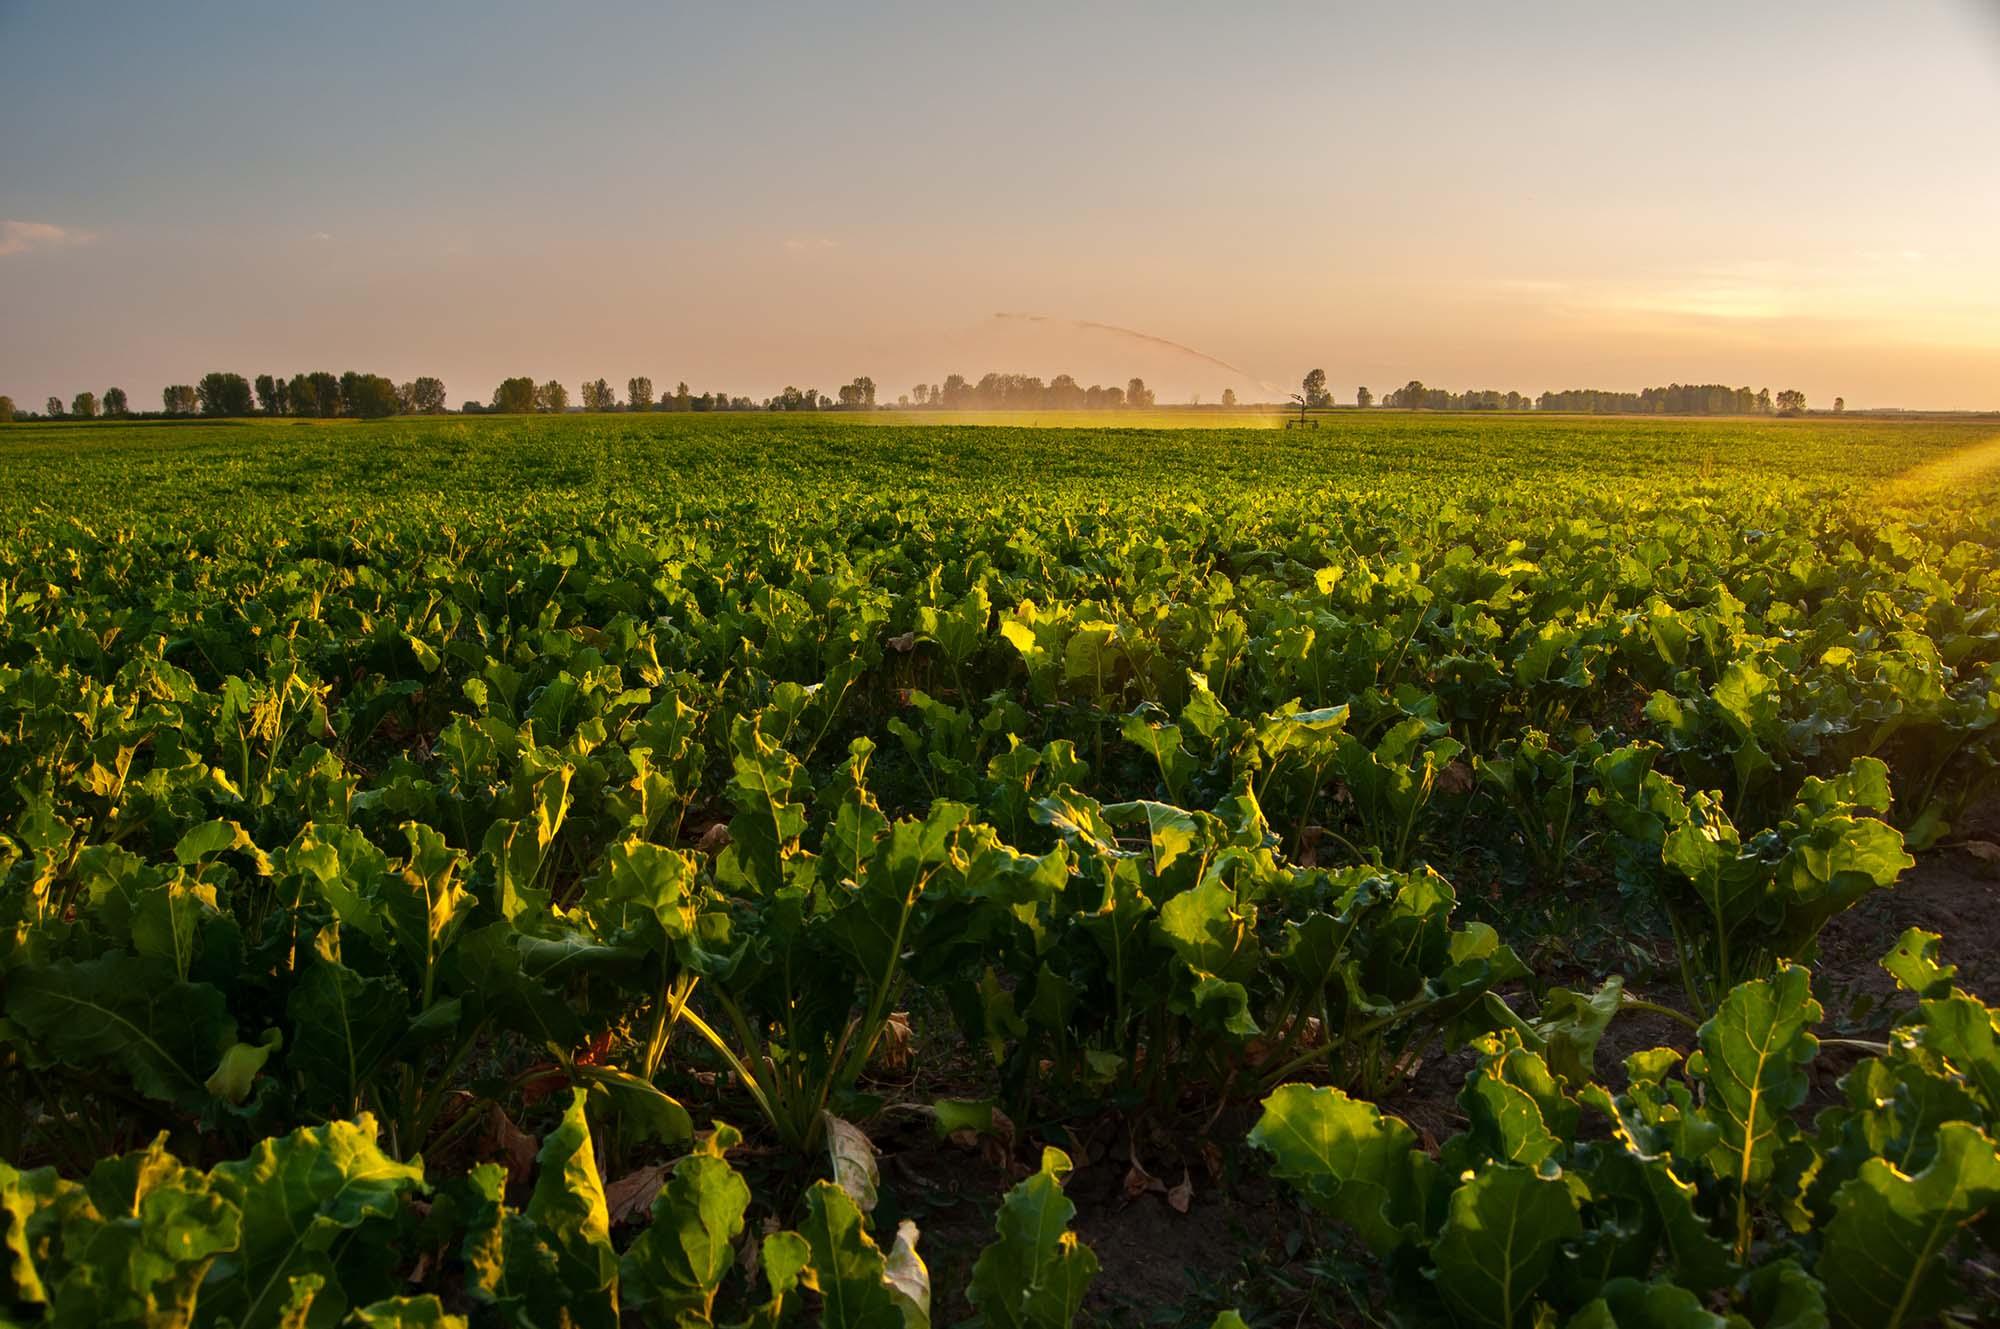 Beet planting in field